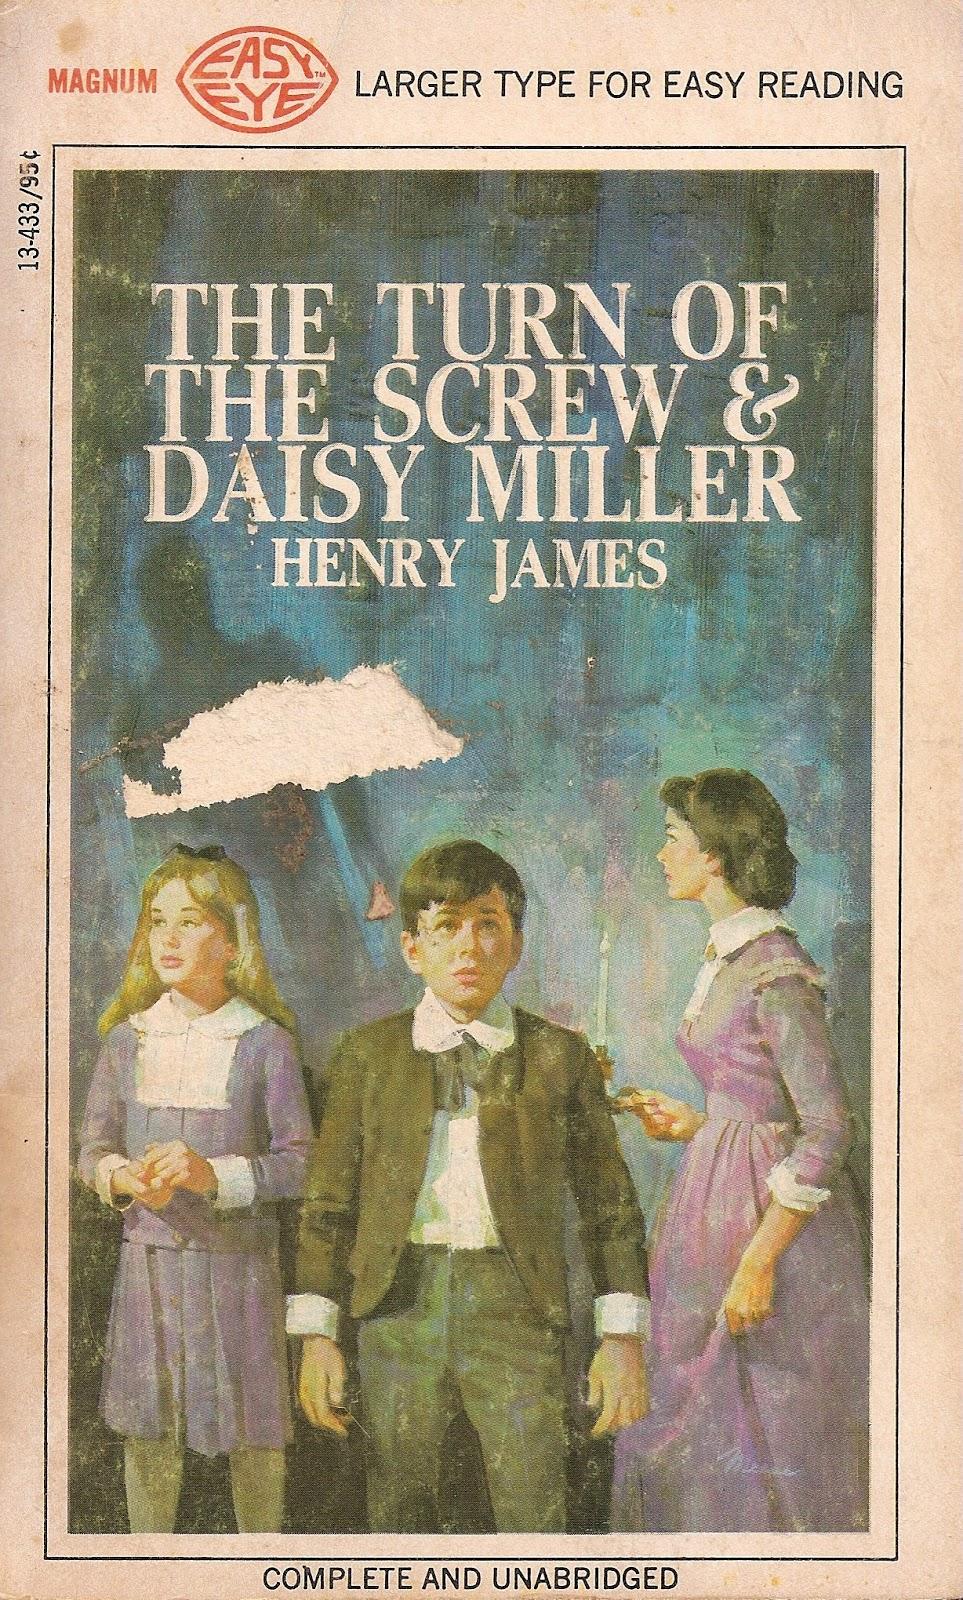 Daisy Miller: Theme Analysis